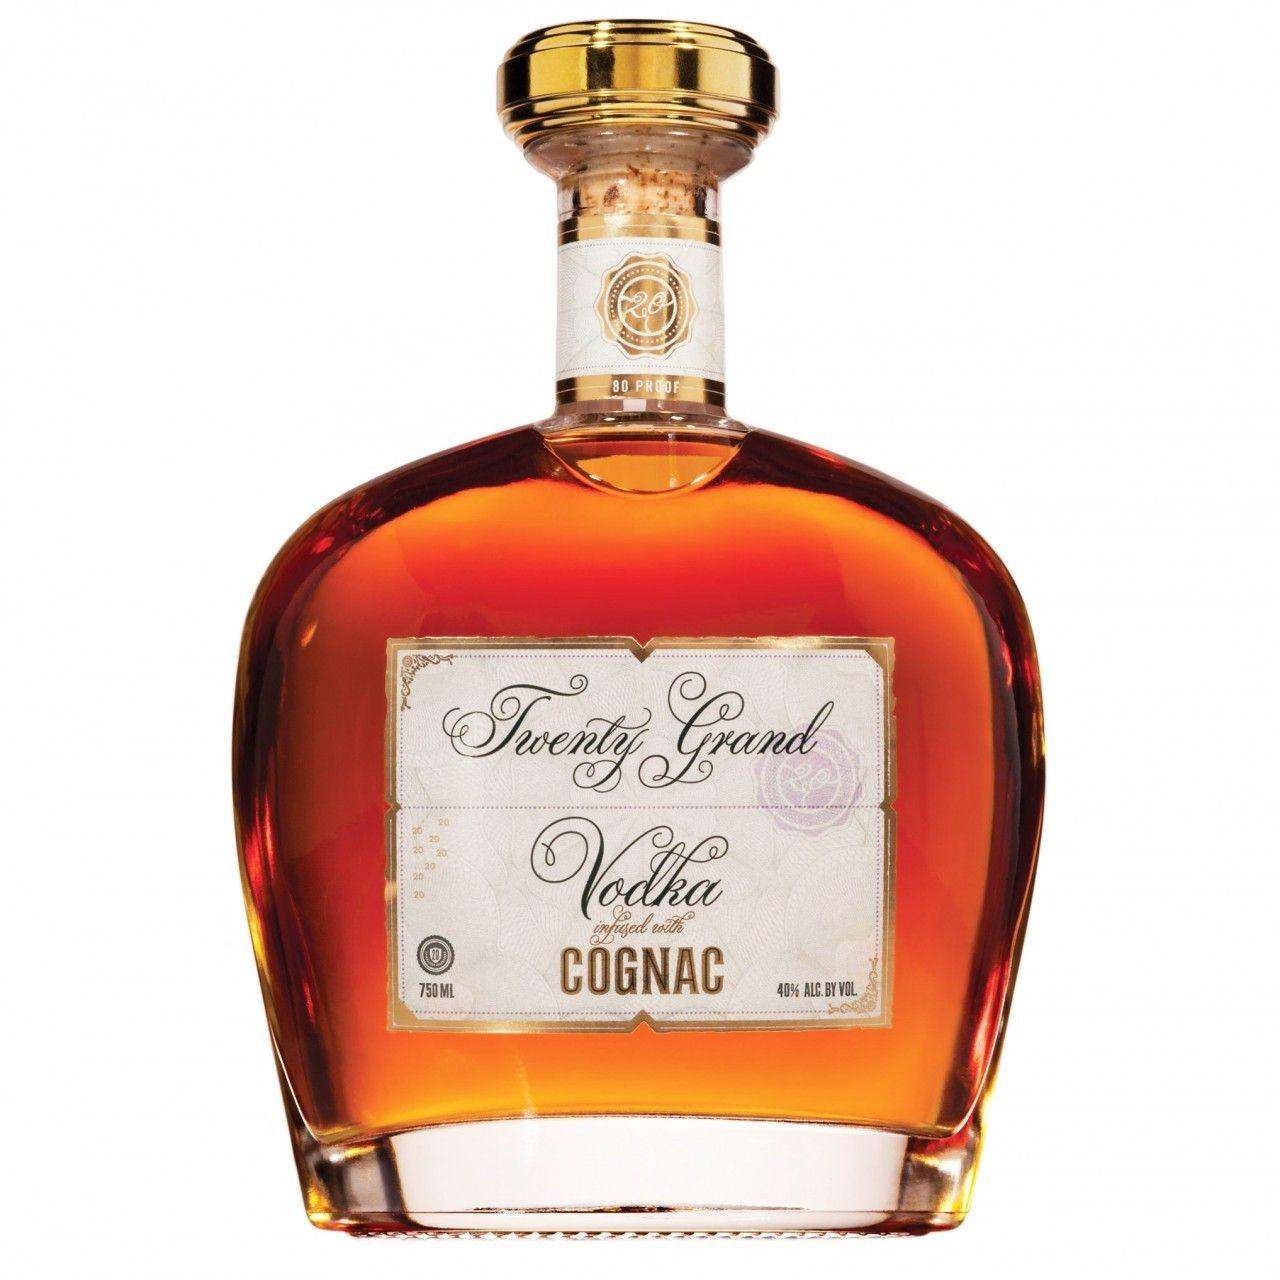 Twenty Grand Vodka Infused With Cognac 750ml Infused Vodka Vodka Wine Bottle Carrier